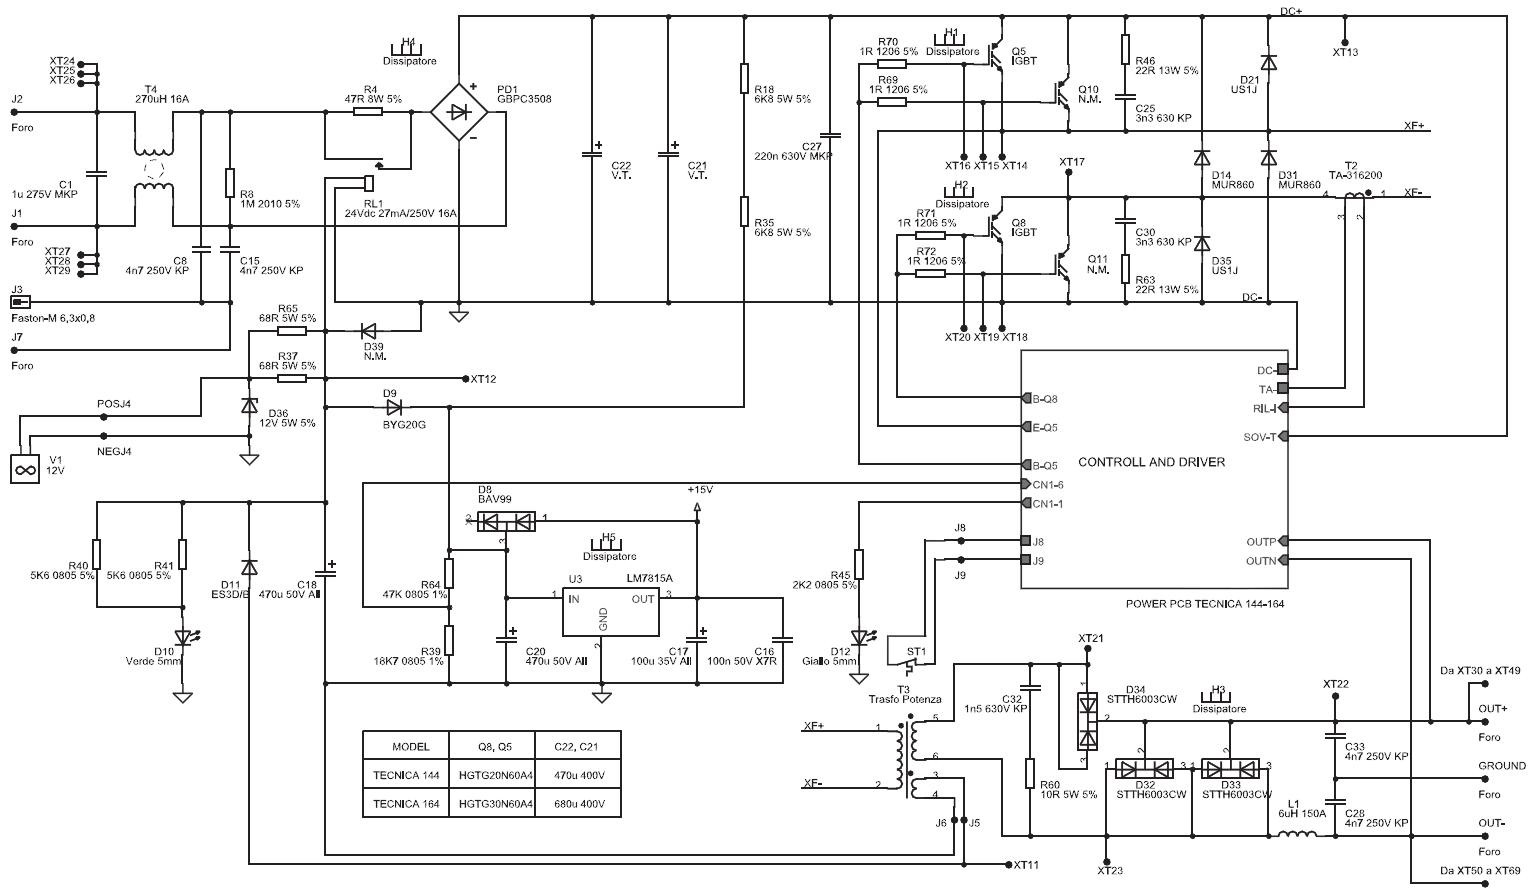 Схема силовой части сварочного аппарата Telwin Tecnica 144-164